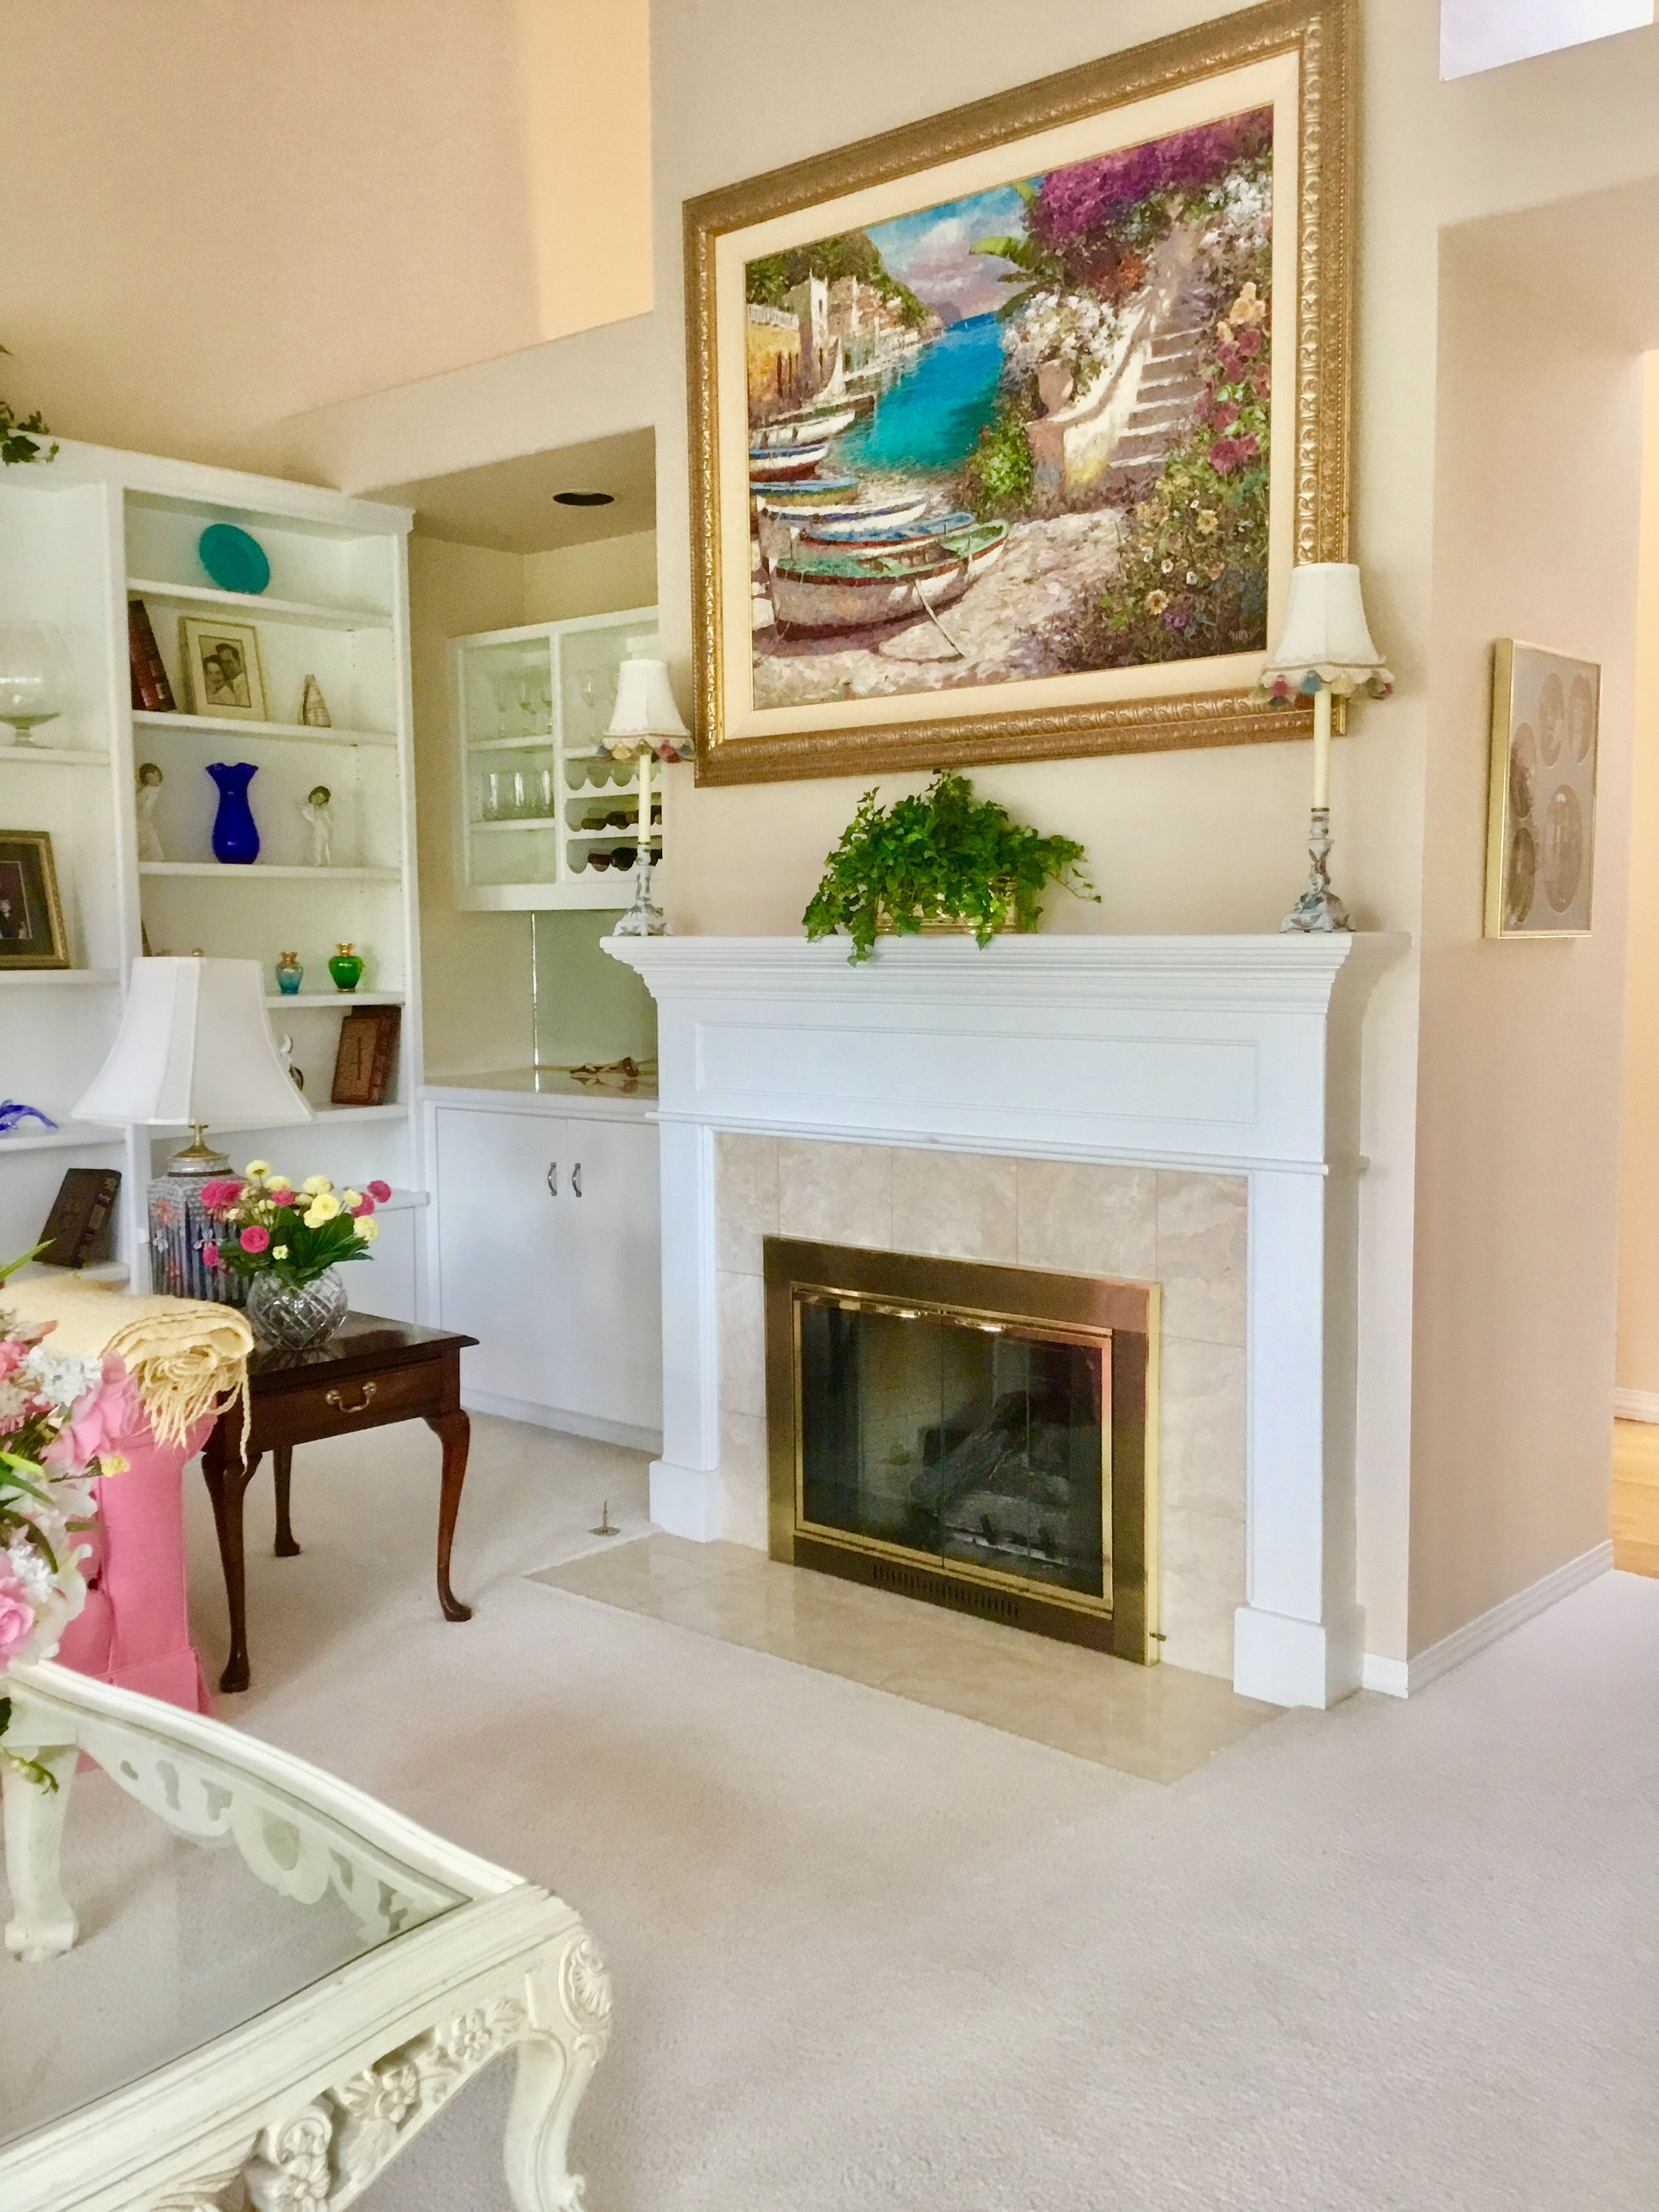 34+ Esprit decor home furnishings ideas